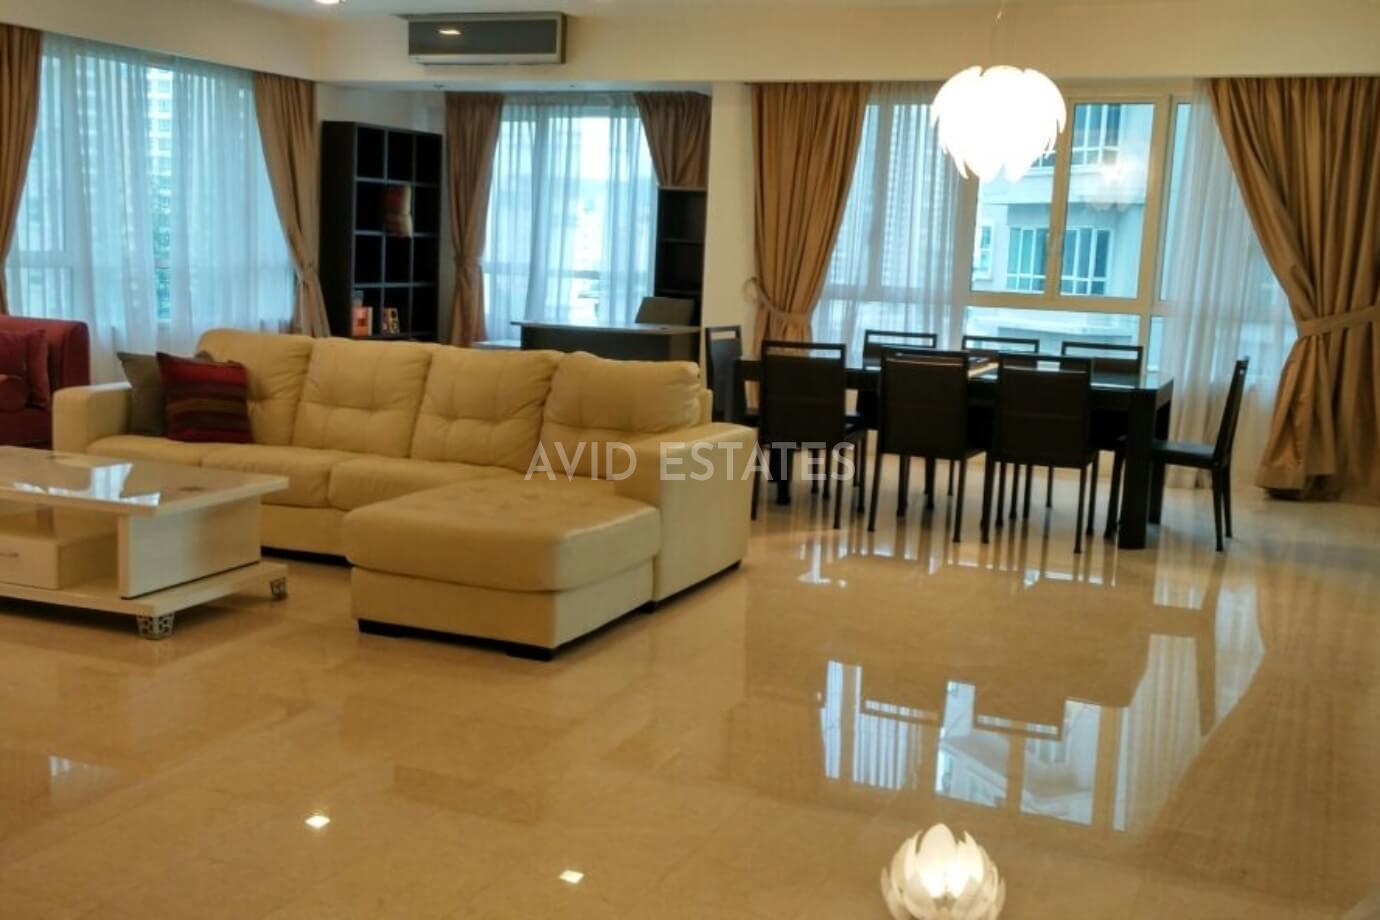 Kiaraville, Mont Kiara,Kuala Lumpur, 4 Bedrooms Bedrooms, ,6 BathroomsBathrooms,Condominium / Serviced Residence,To Let,Kiaraville,1406